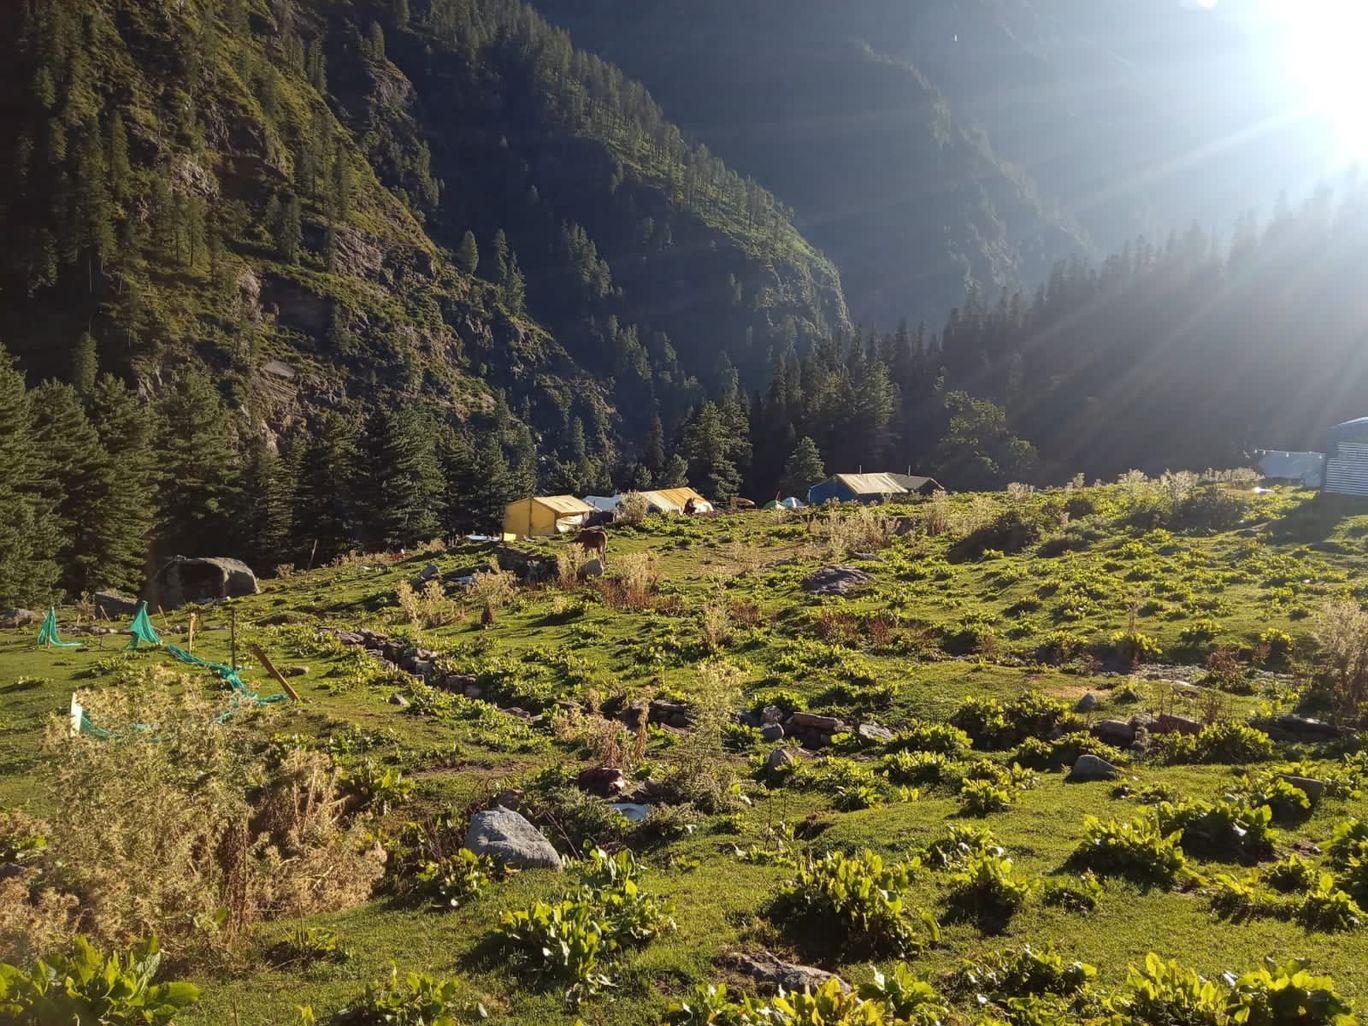 Photo of Kheerganga Trek By Priya Achar